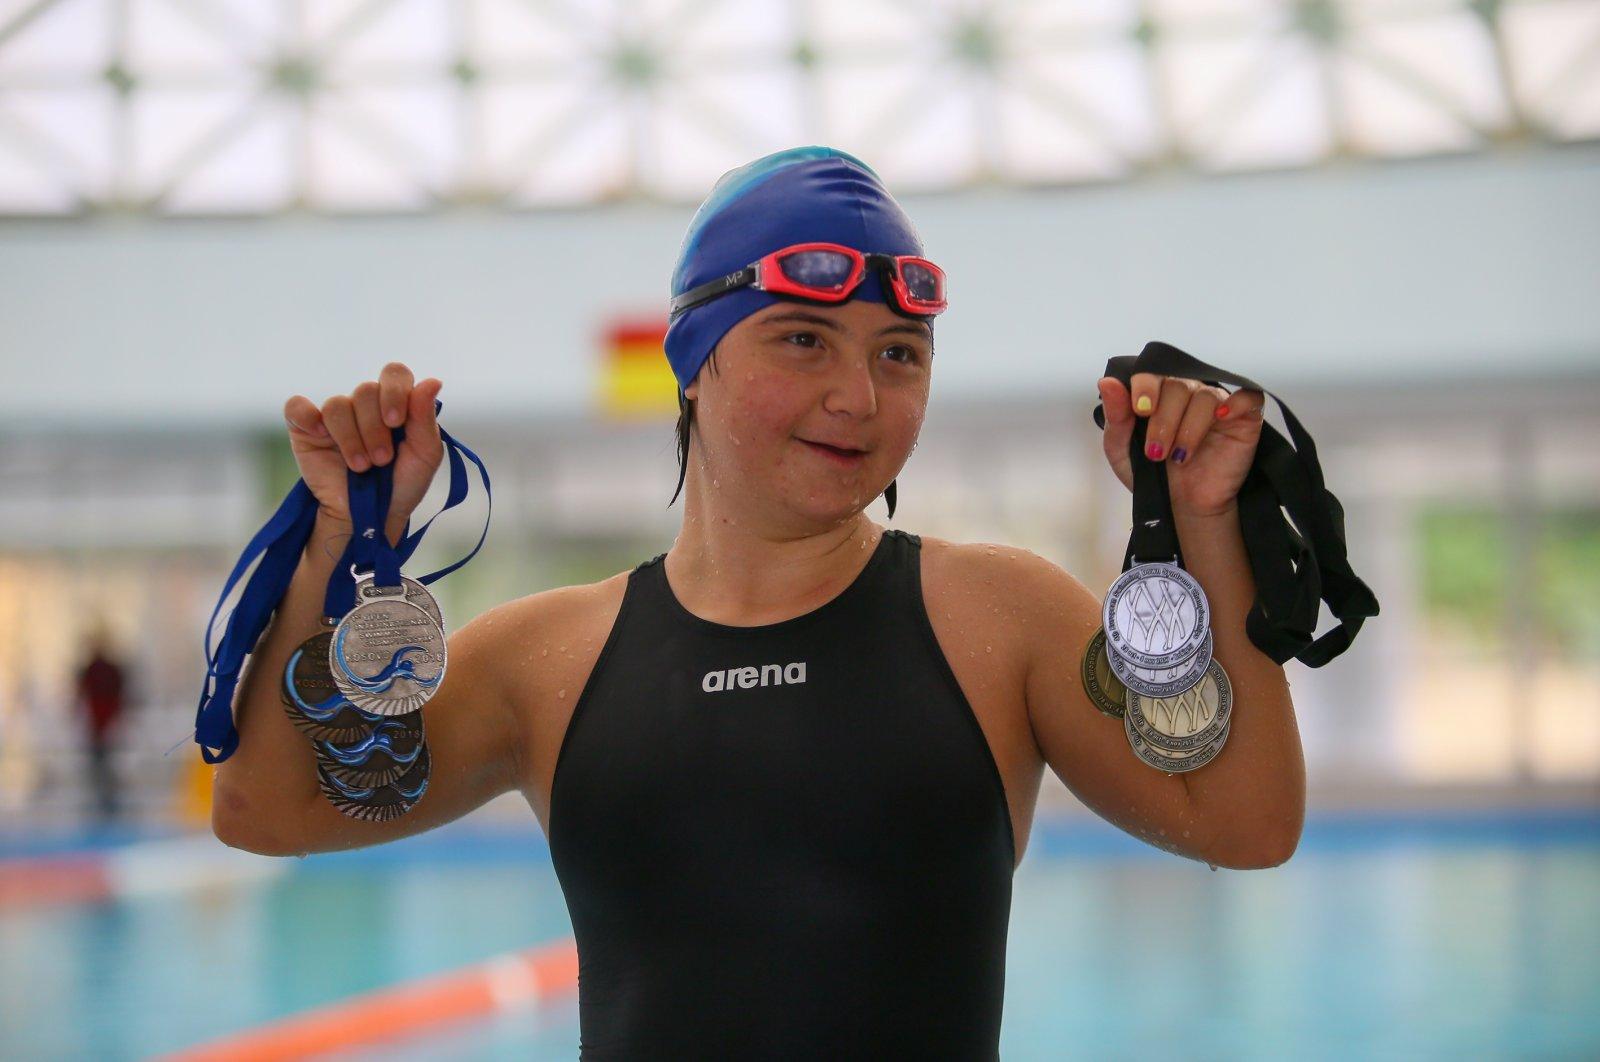 Irem Öztekin poses with her medals at an indoor pool, in Izmir, Turkey, Oct. 30, 2020. (AA Photo)